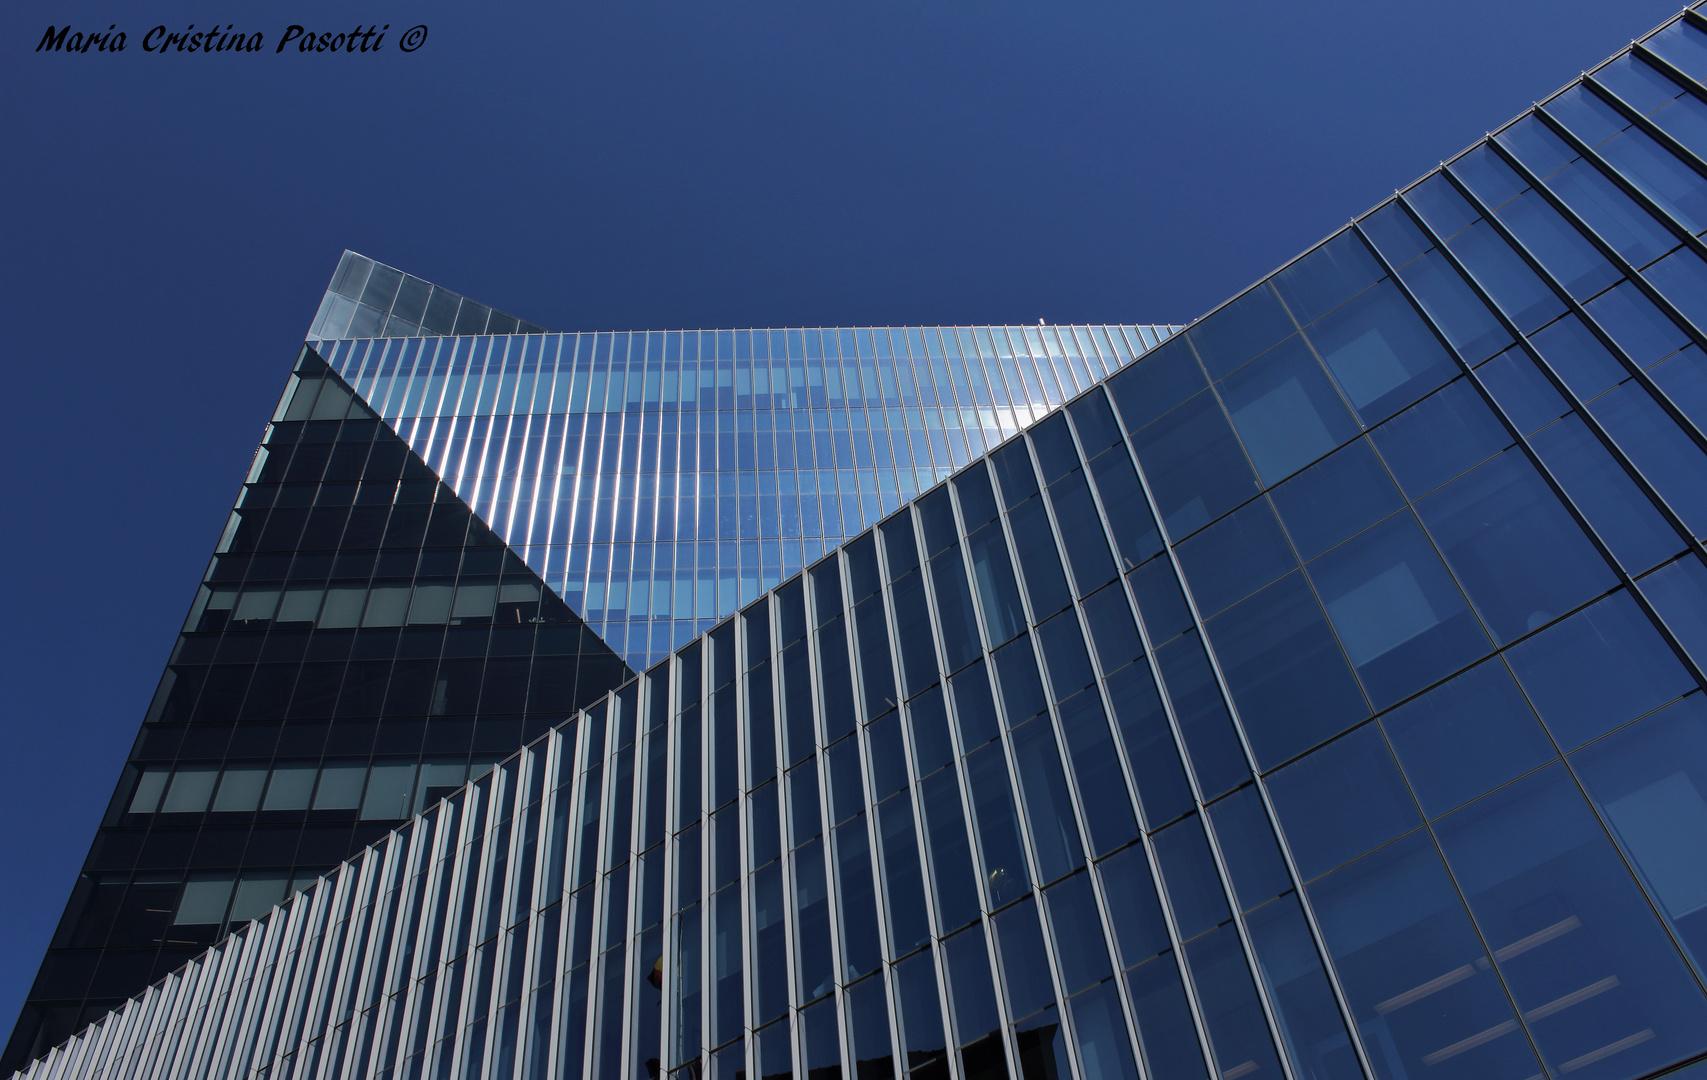 New York City - Skyscrapers